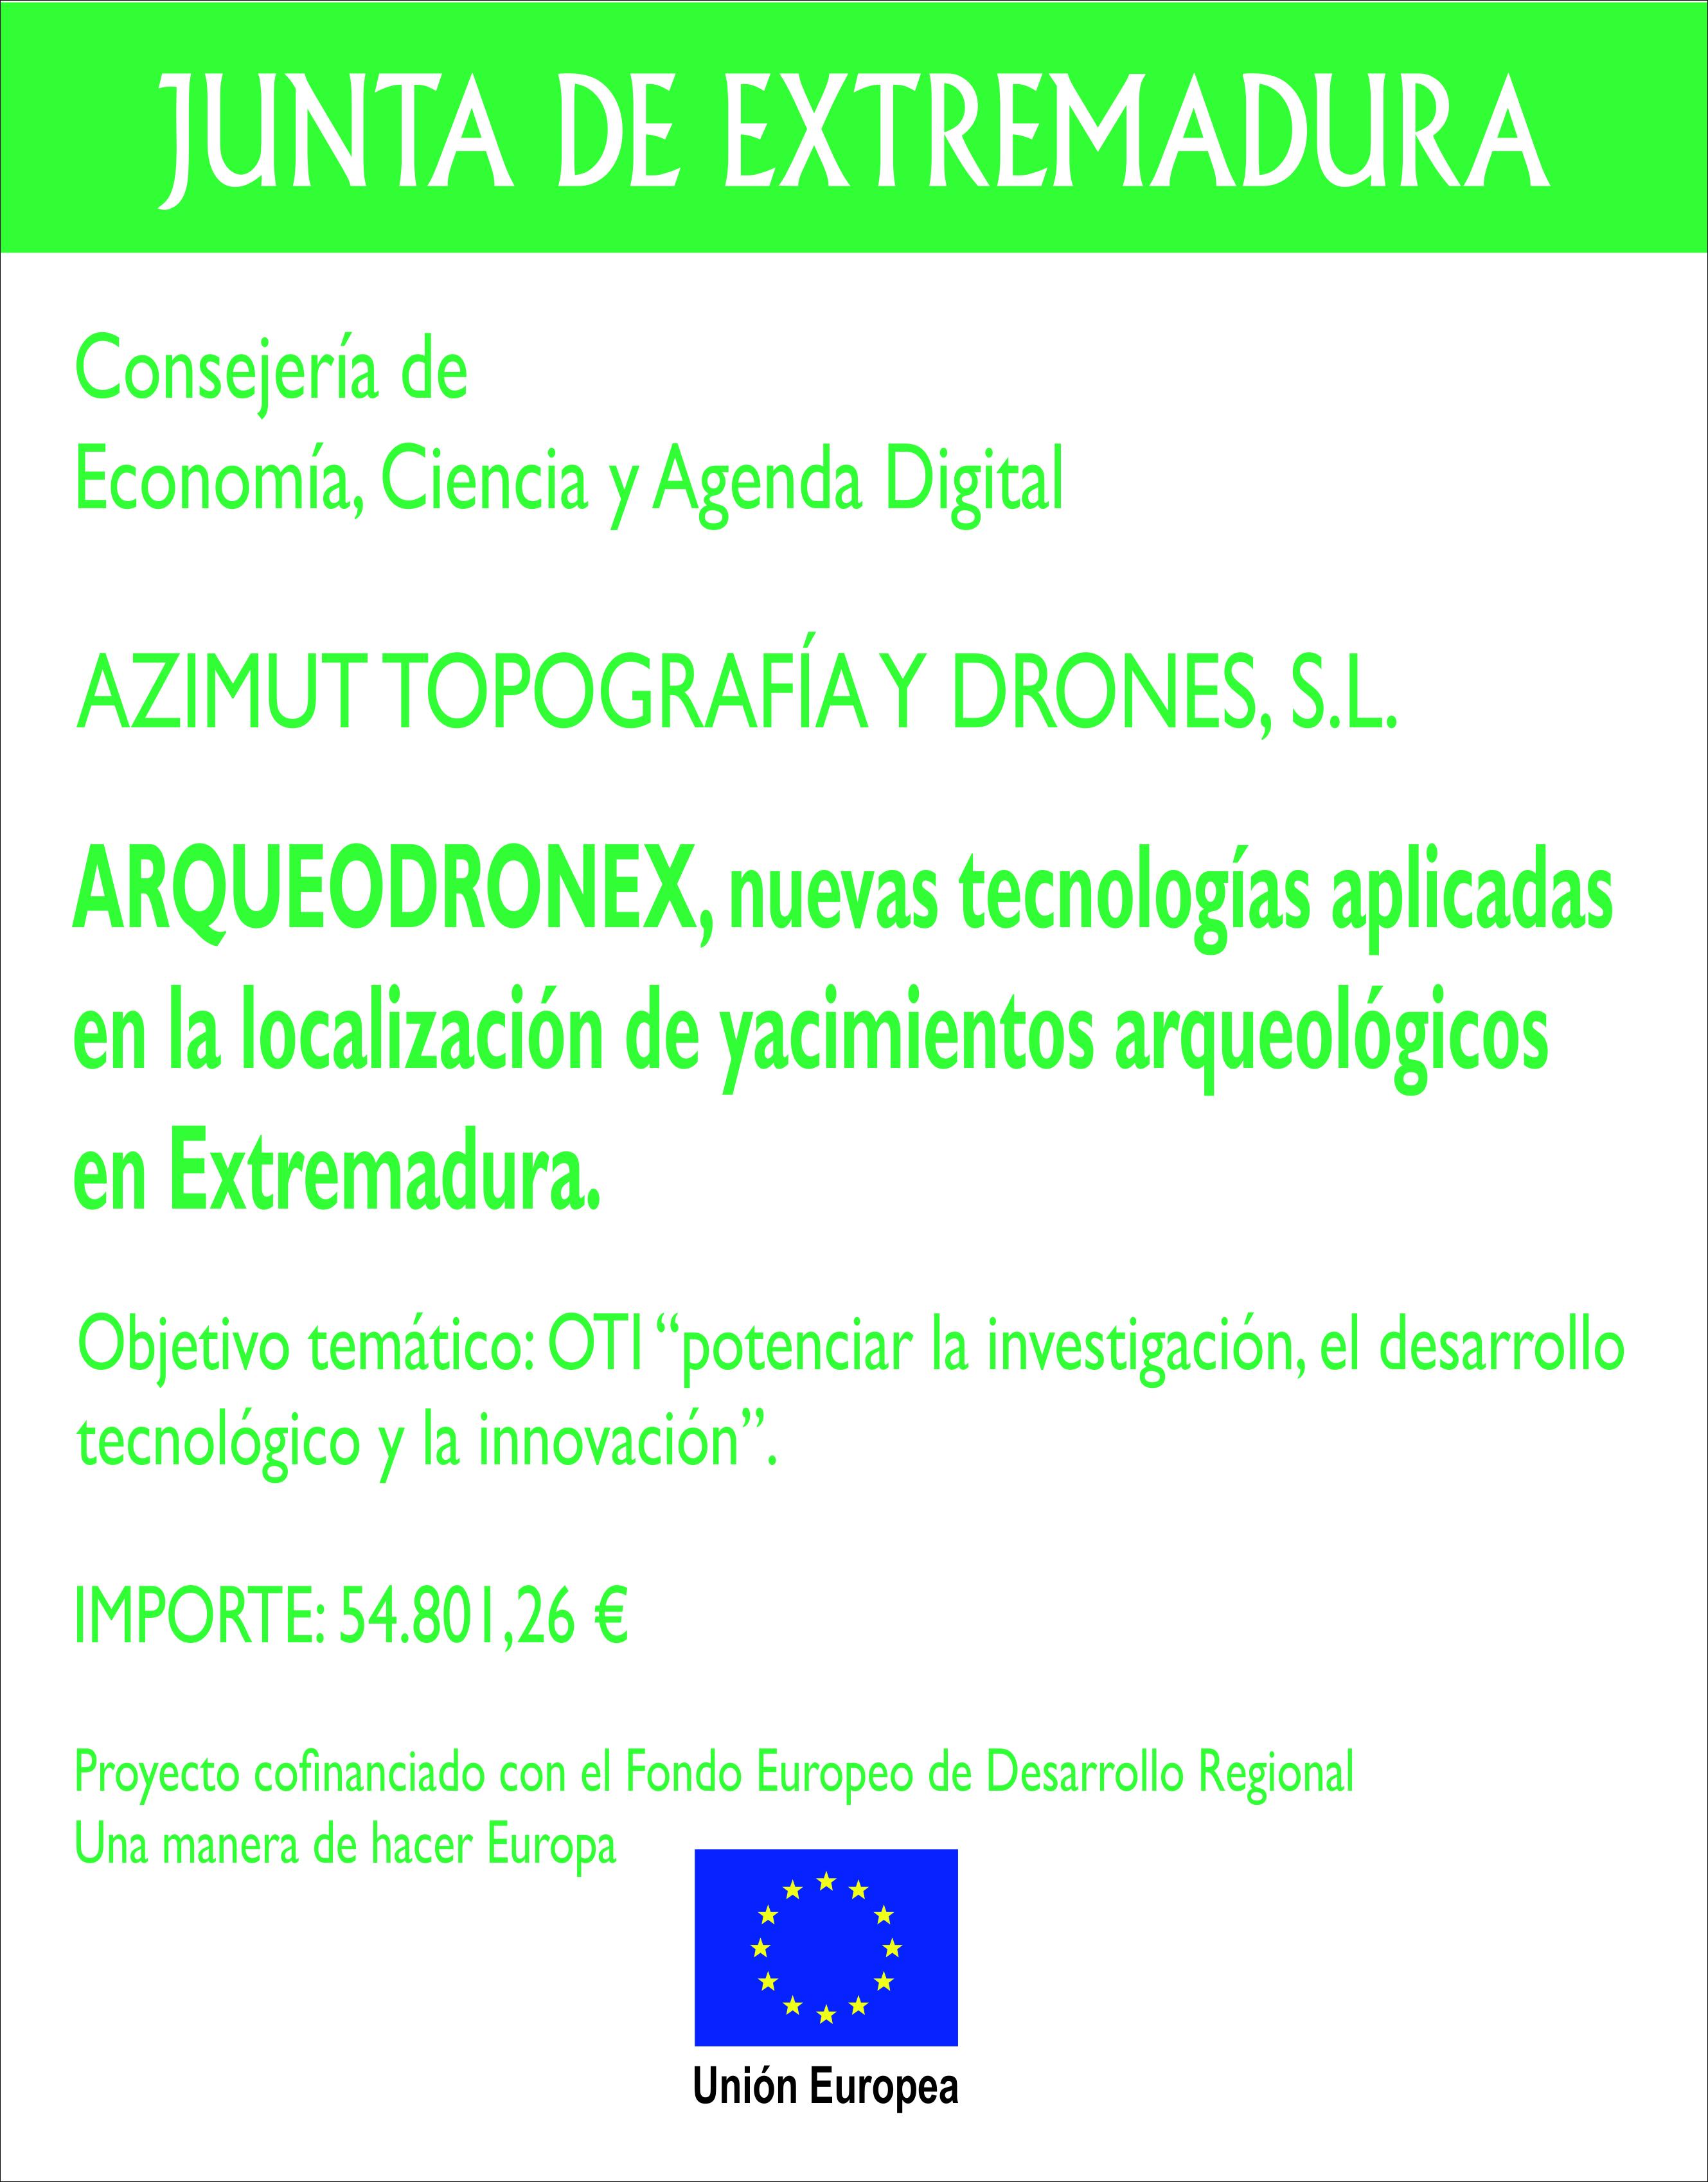 DISEÑO CARTEL AZIMUT ARQUEODRONEX MODELO 1